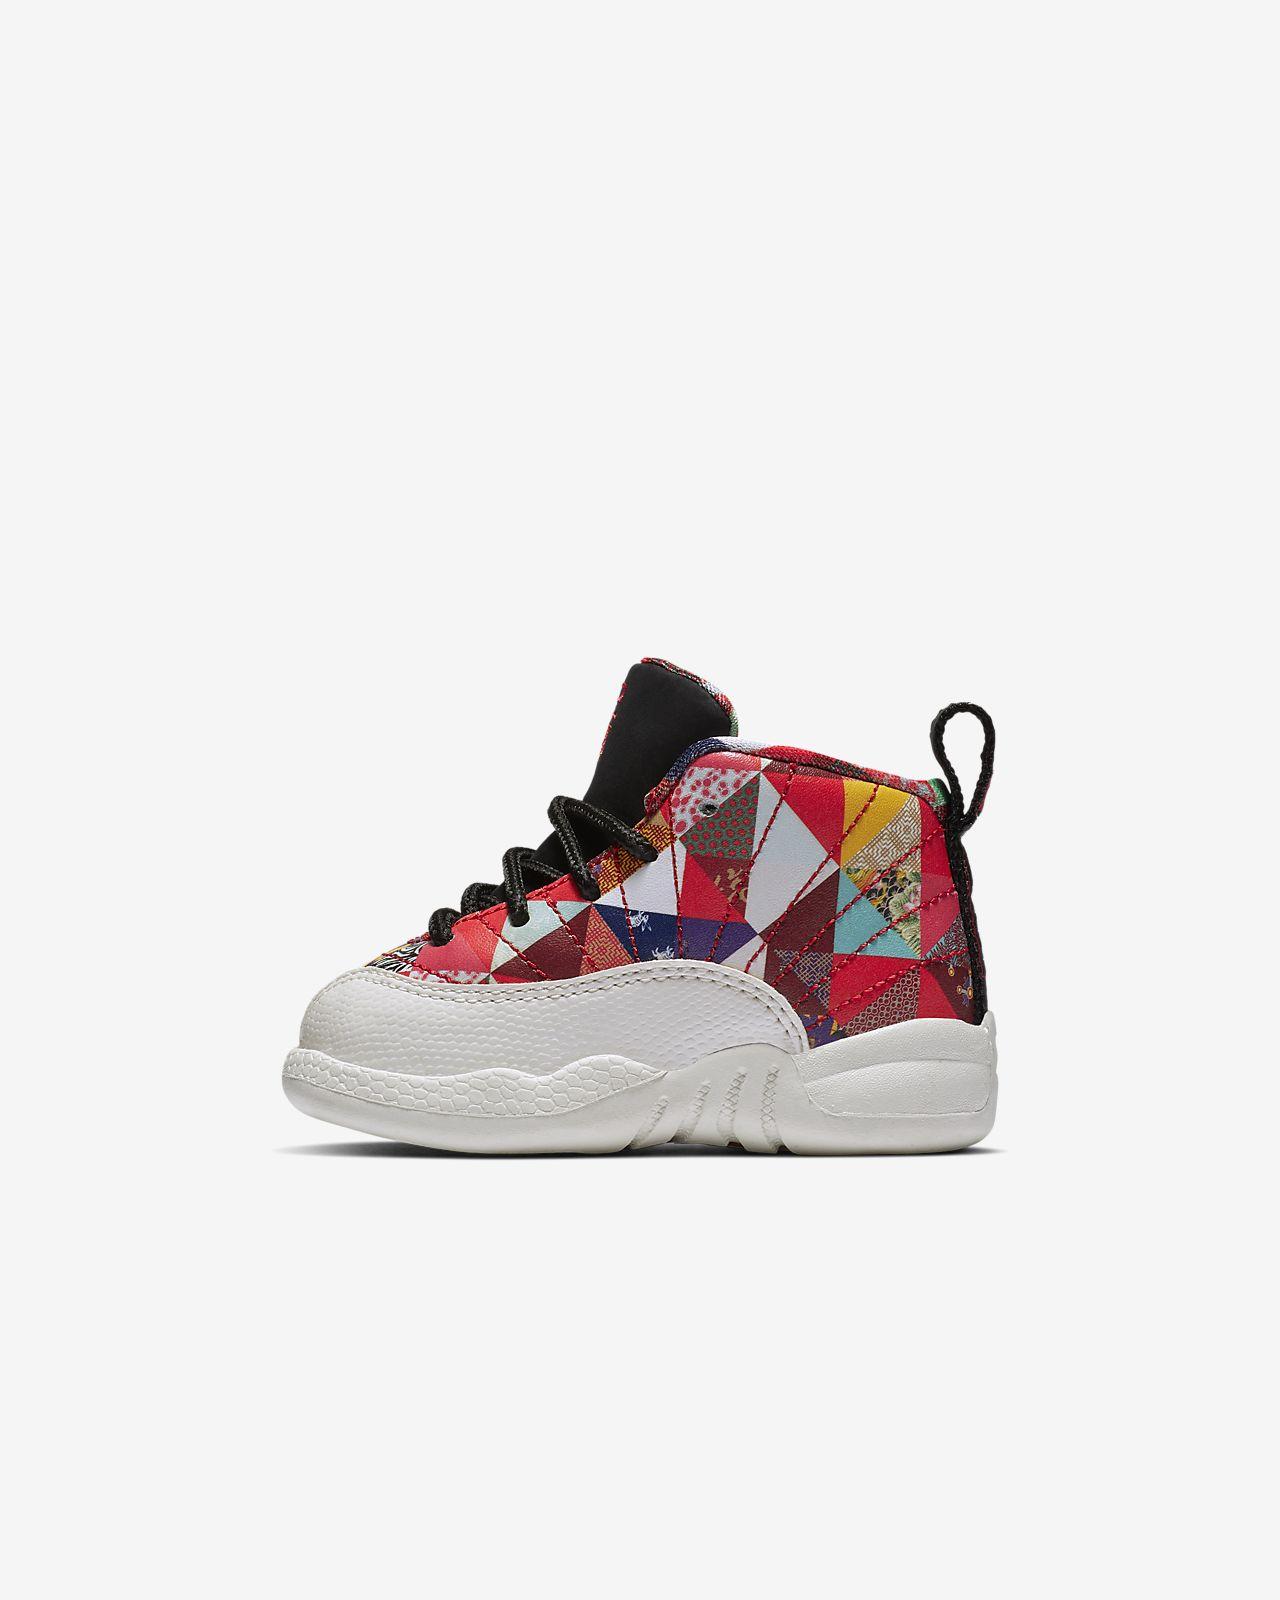 b856f0b7faffc1 Air Jordan 12 Retro CNY Baby Toddler Shoe. Nike.com